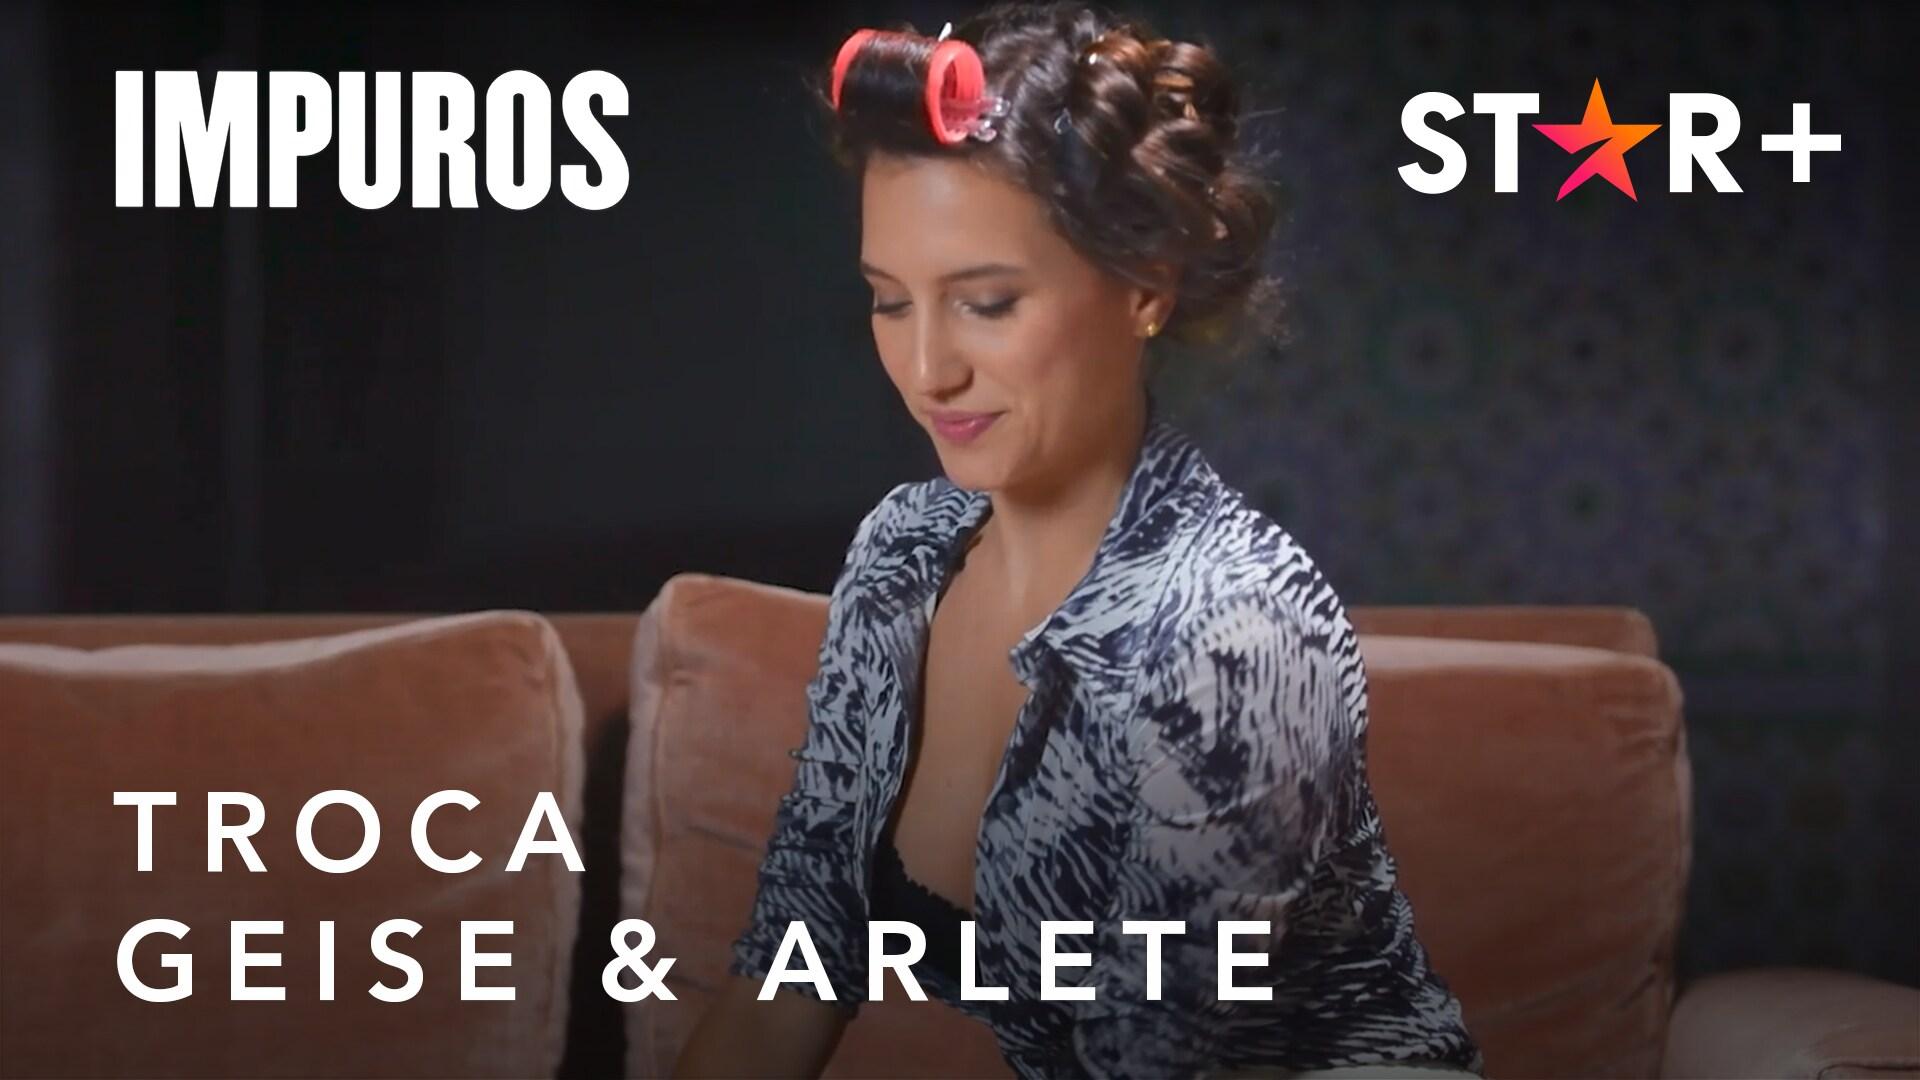 Impuros | Troca - Geise x Arlete | Star+